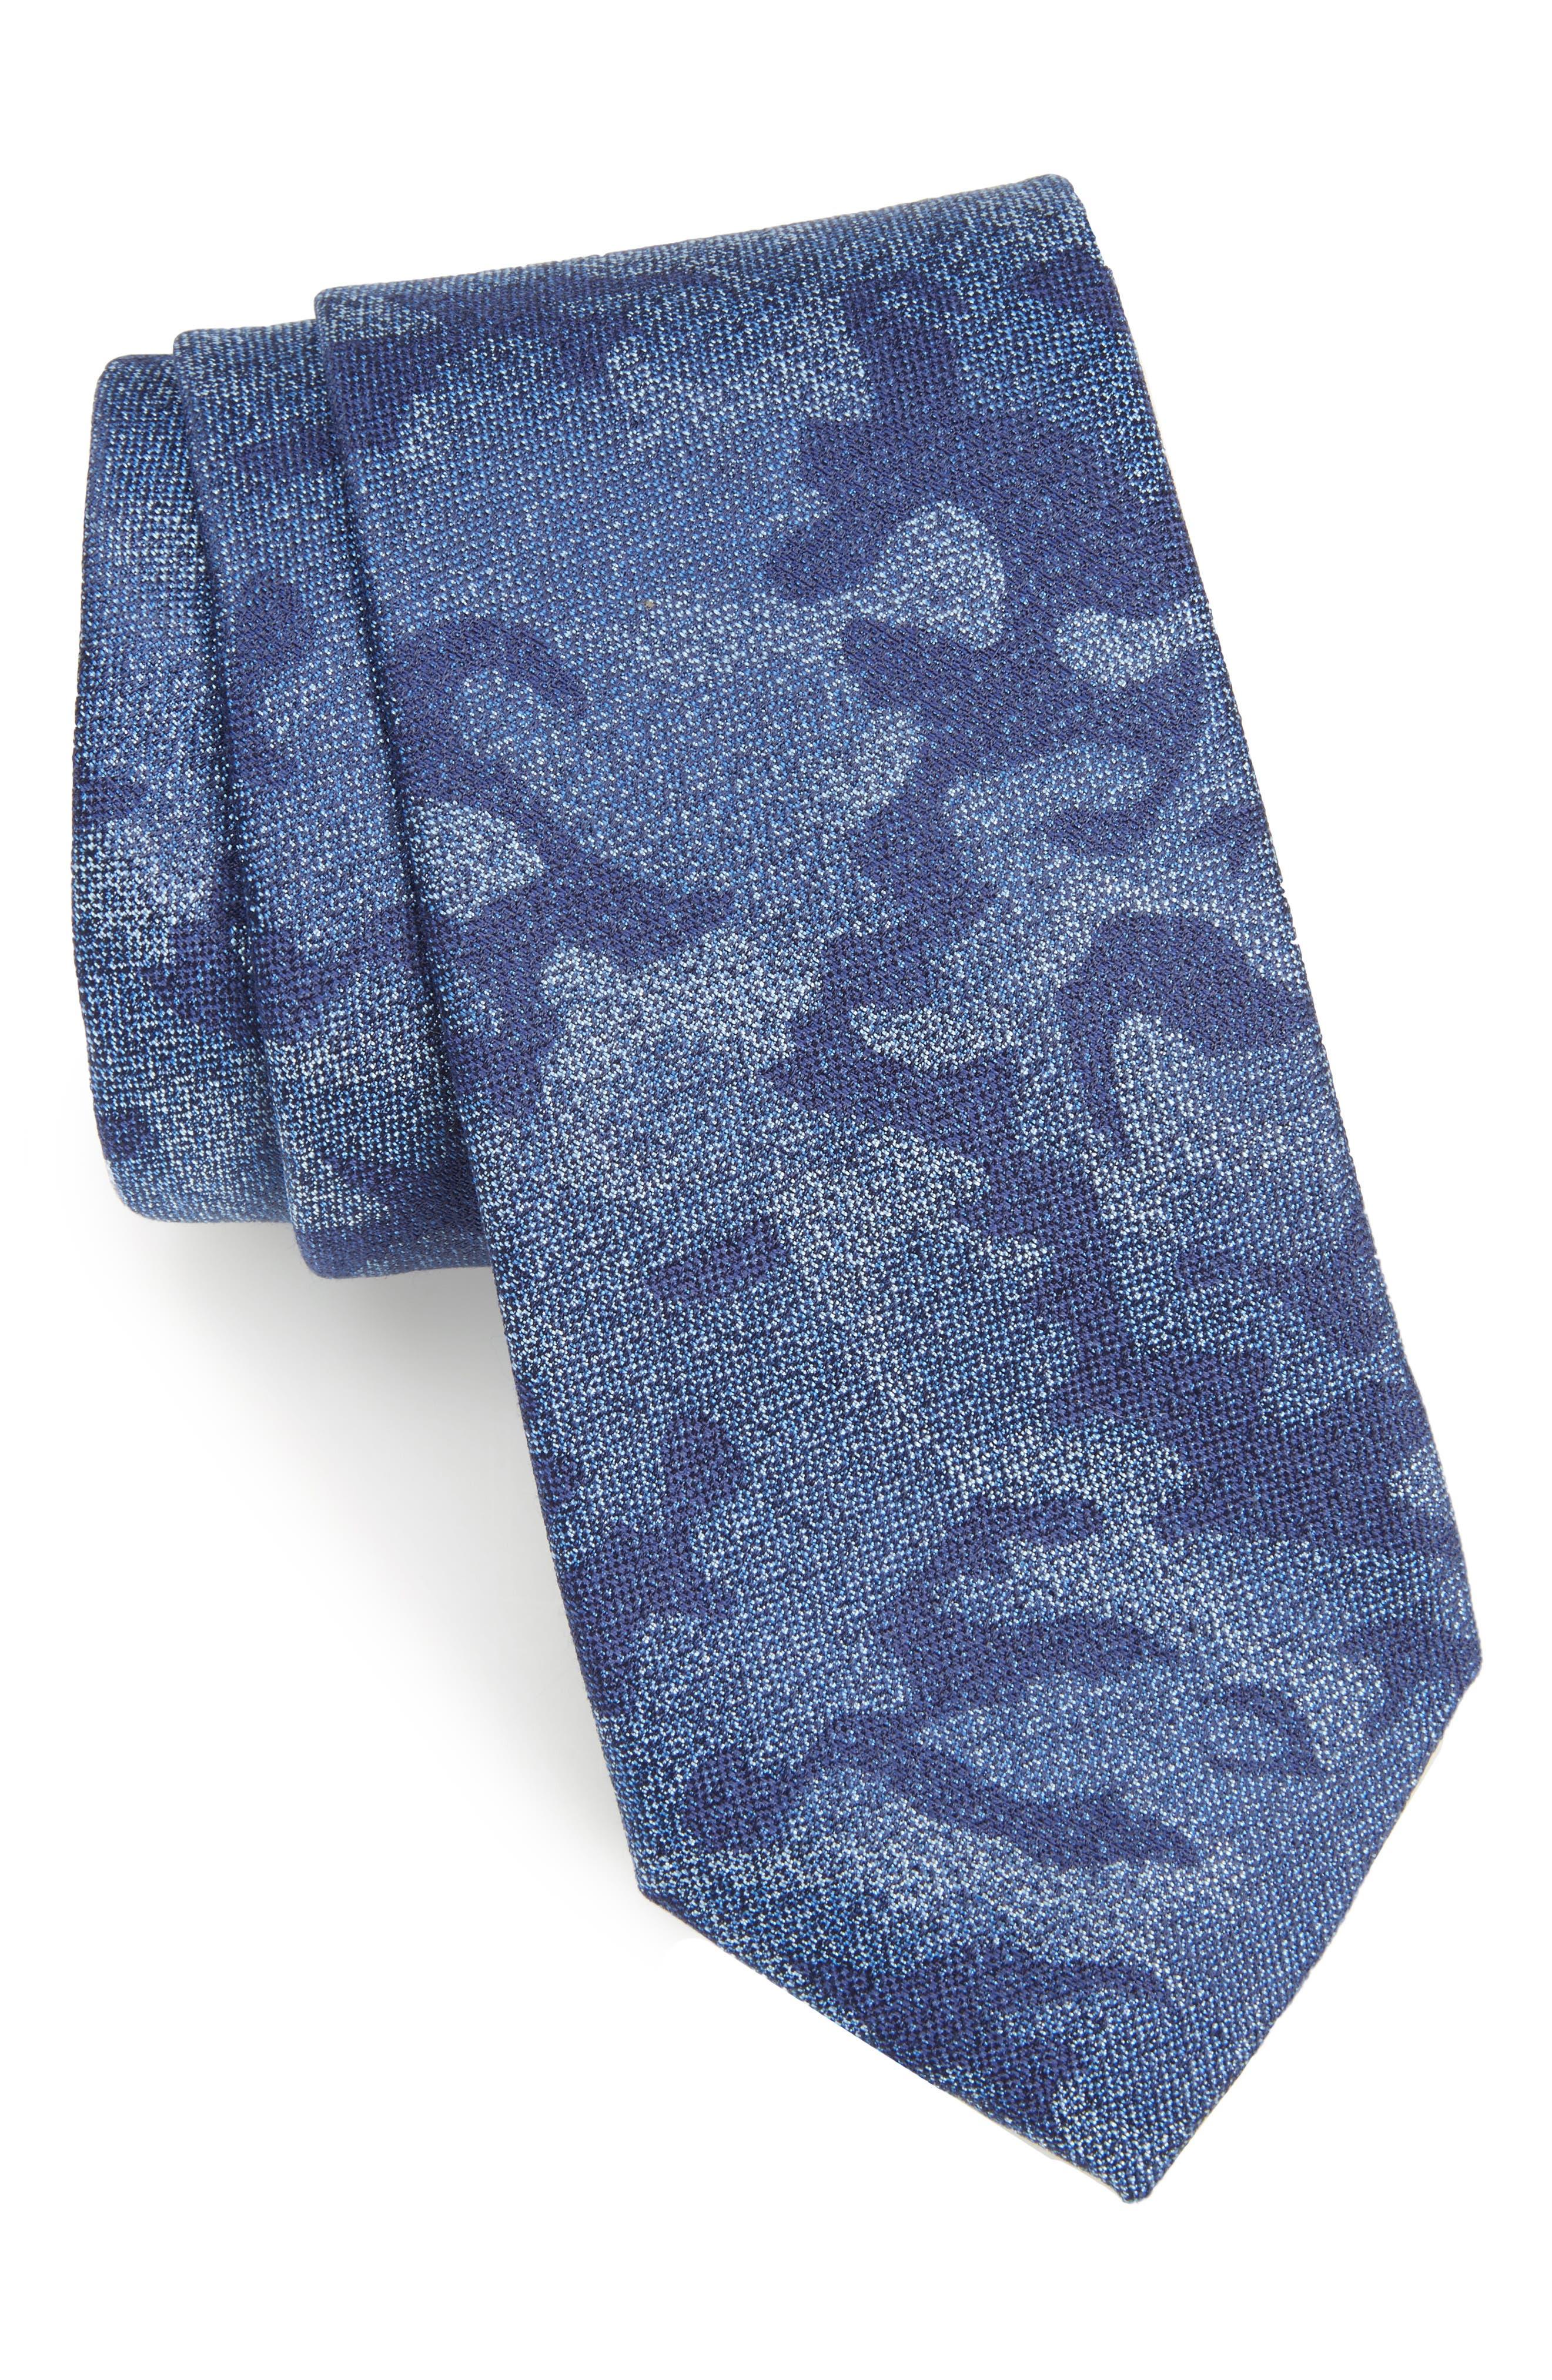 Main Image - Calibrate Morada Camo Silk & Cotton Tie